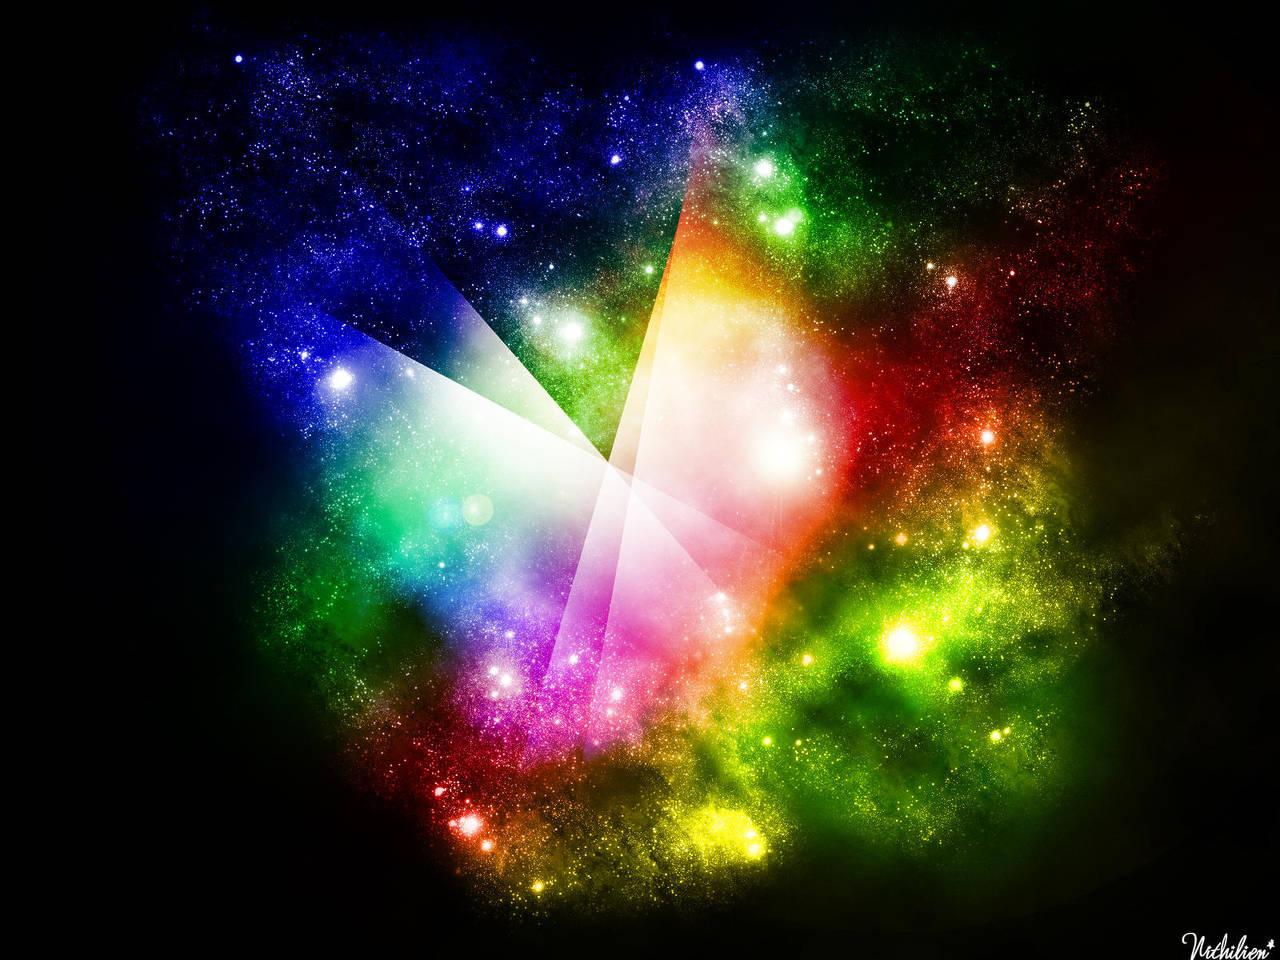 Starsfield Rainbow wallpaper by nithilien